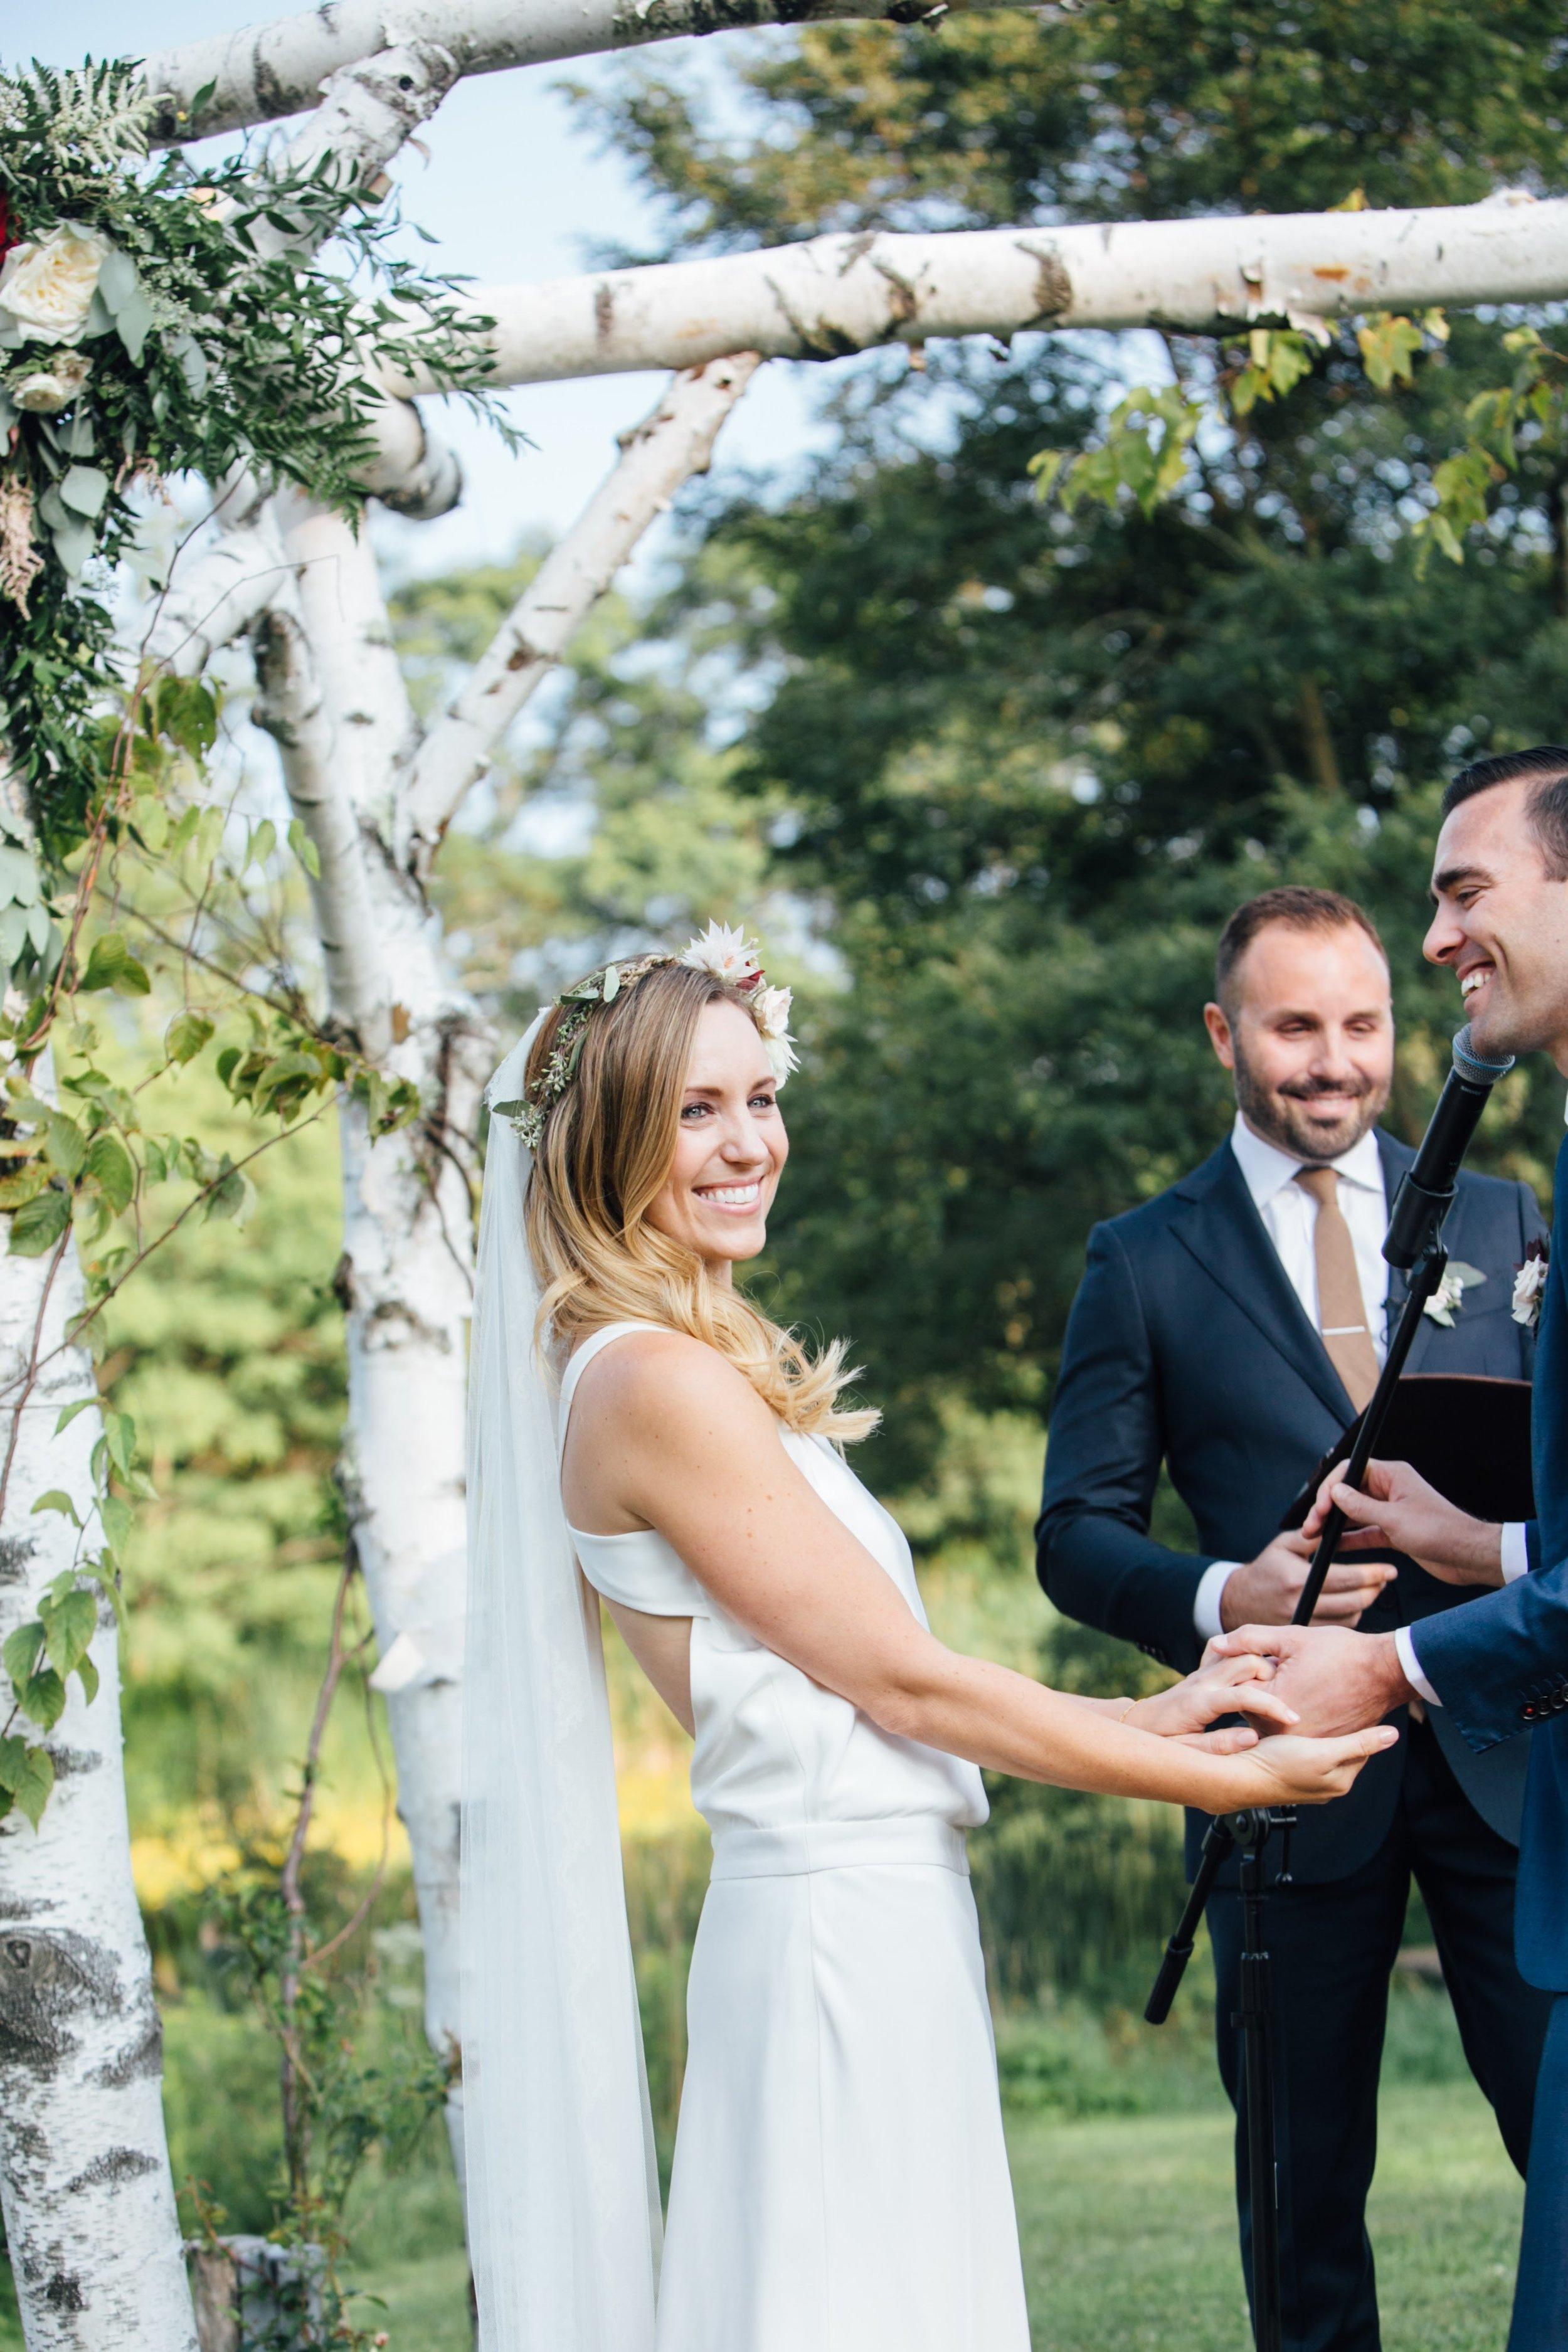 Courtney + Matt Blenheim Hill Farm Catskills NY Wedding Veronica Lola Photography 2017-410.jpg